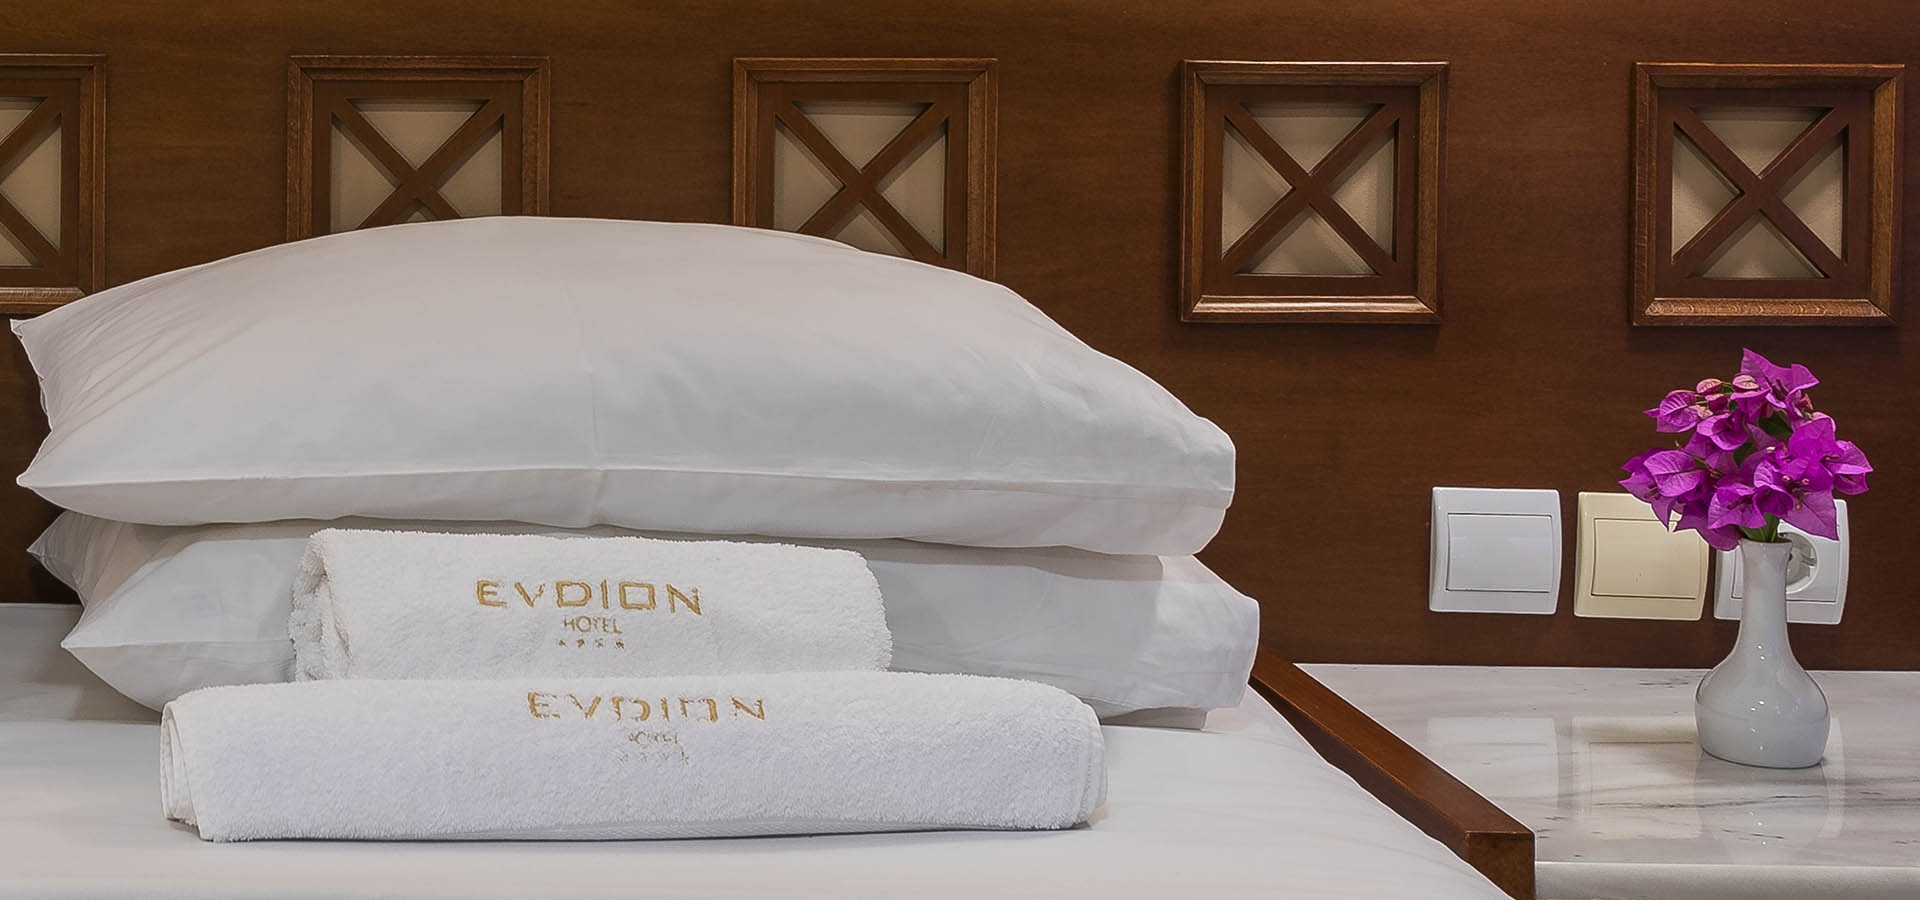 pieria hotel offers - Evdion Hotel